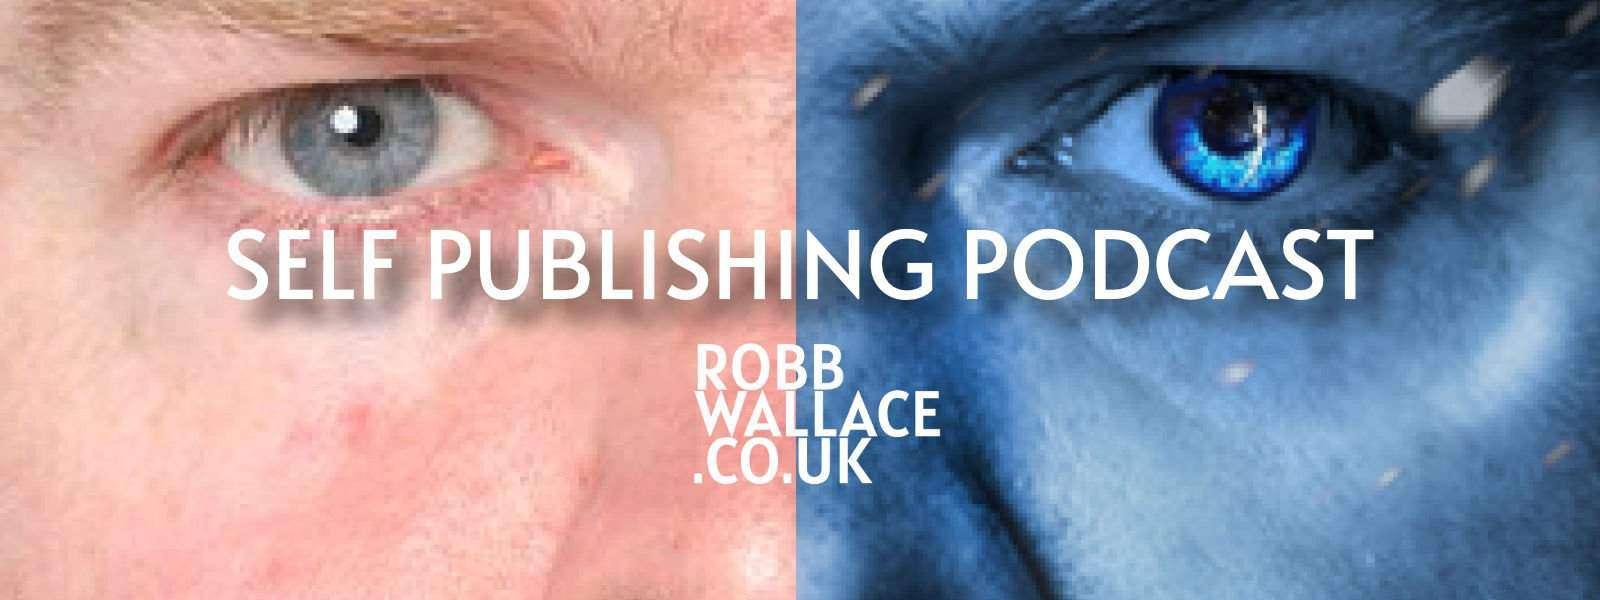 self-publishing-podcast-robb-wallace